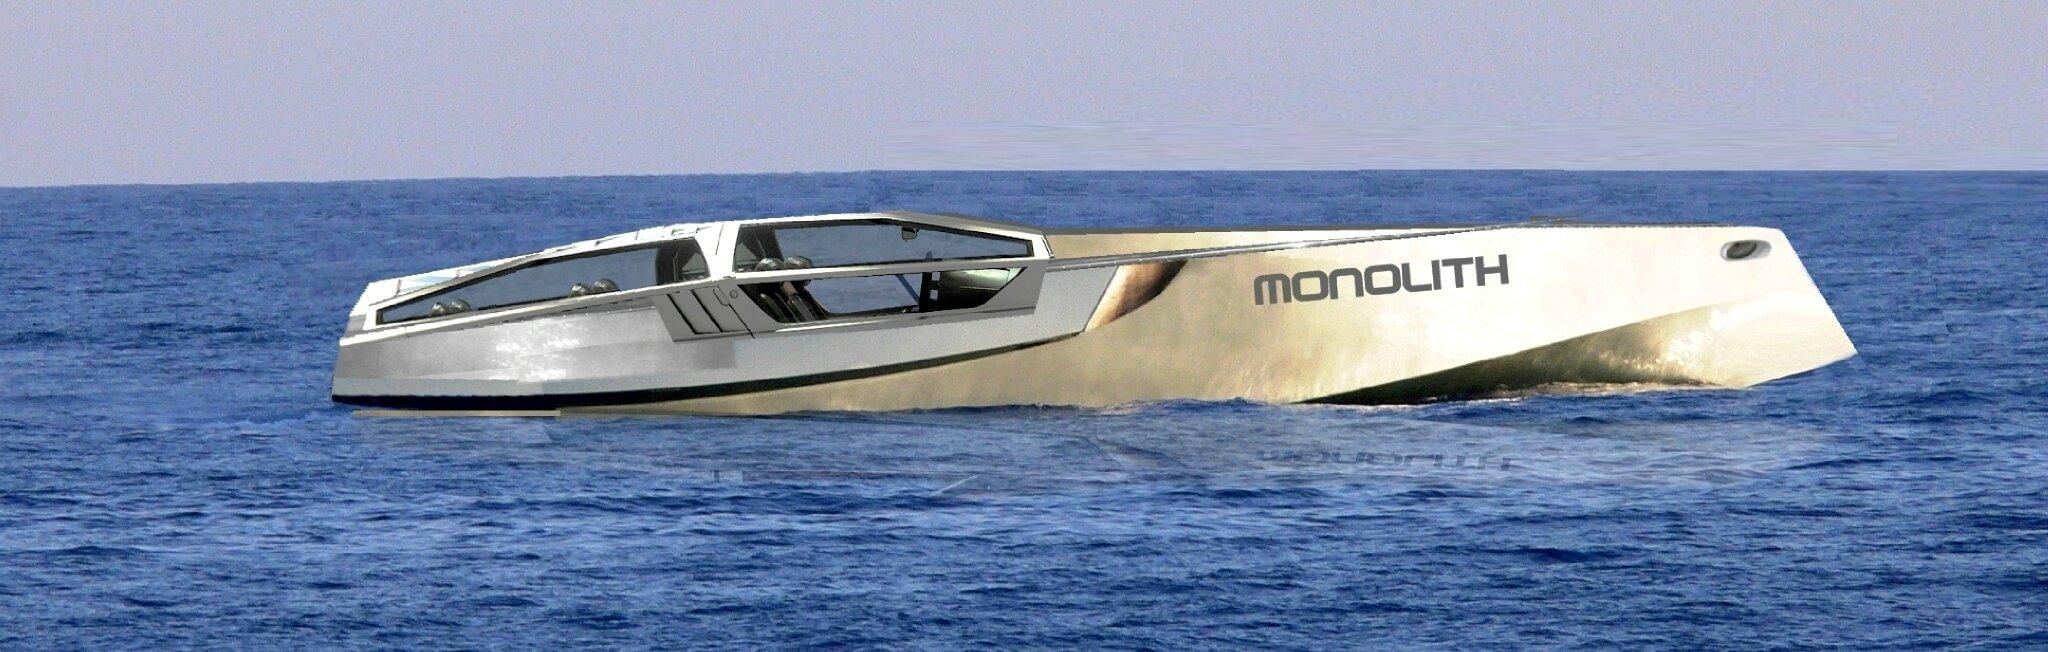 futuristic boat,futuristic boat concept,futuristic tender,futuristic vessel,vessel design,vessel concept,tender design,tender boat concept,french designer,french design,luxury speed boat,luxury motorboat ,jeune designer 3